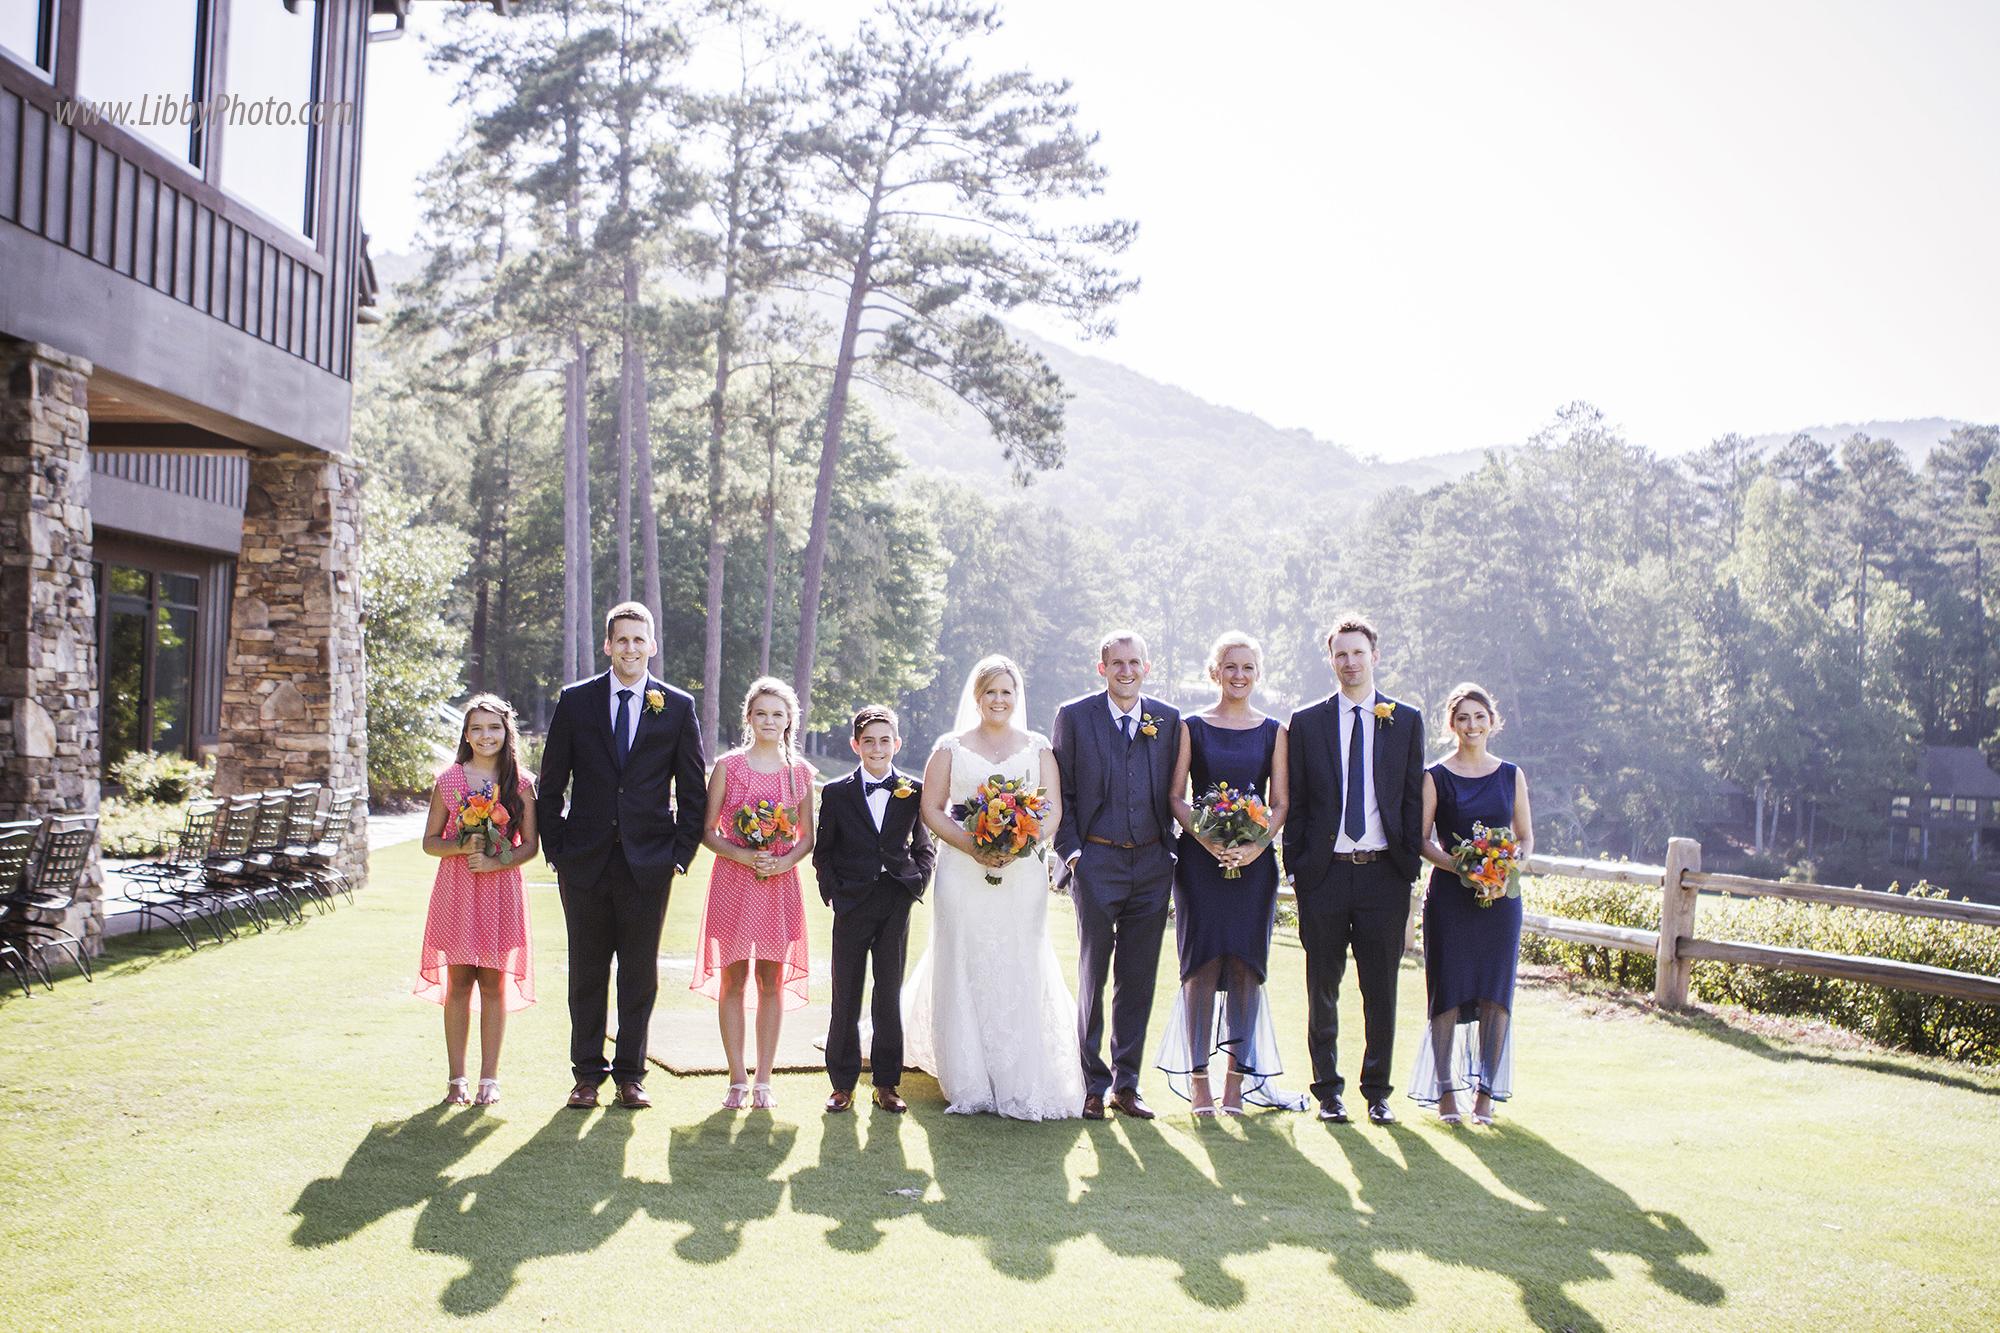 Atlanta wedding photography, Libbyphoto11 (13).jpg